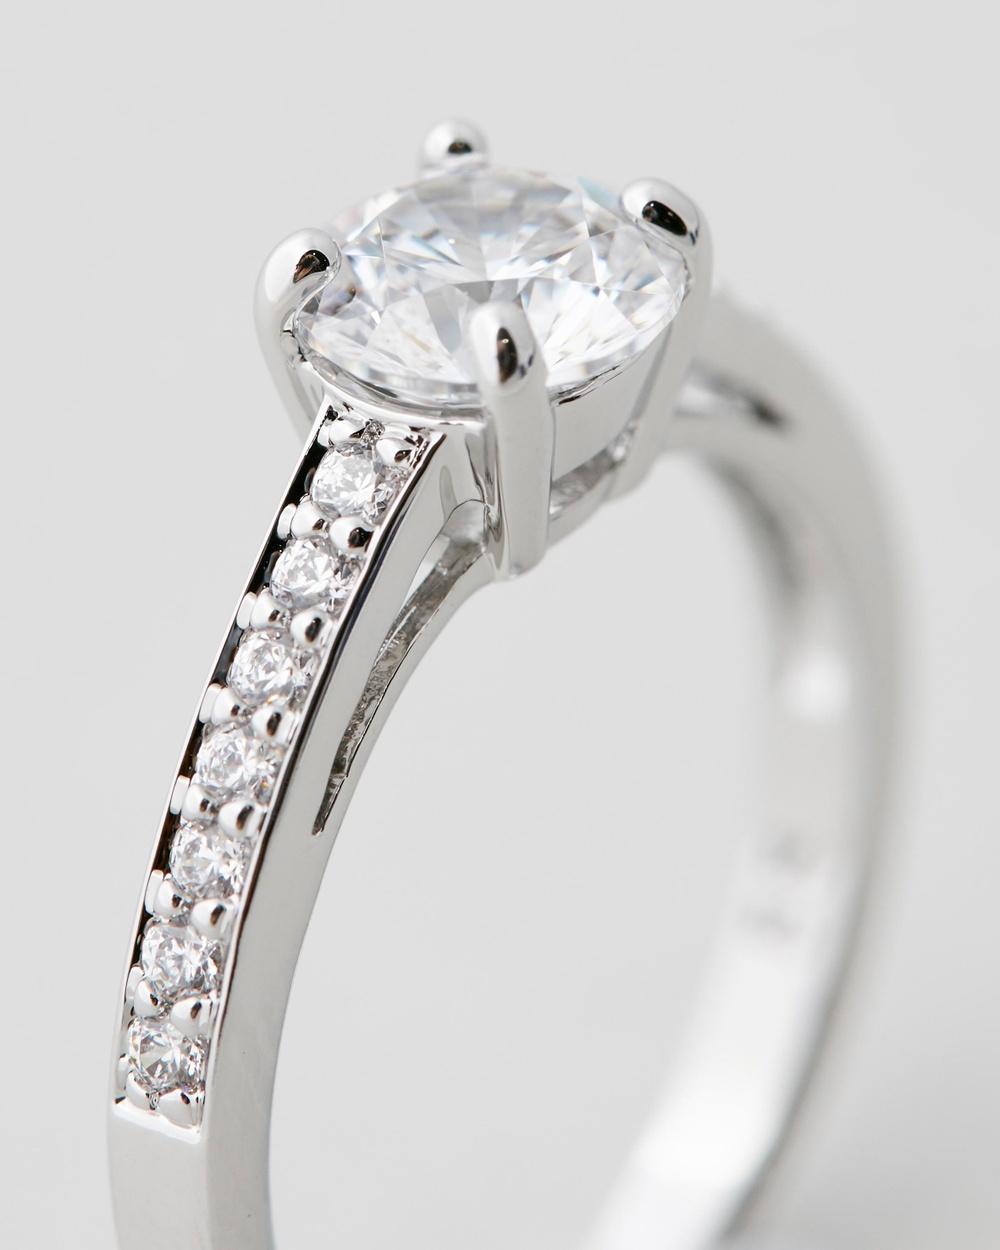 Swarovski Attract Pave Ring Jewellery Silver